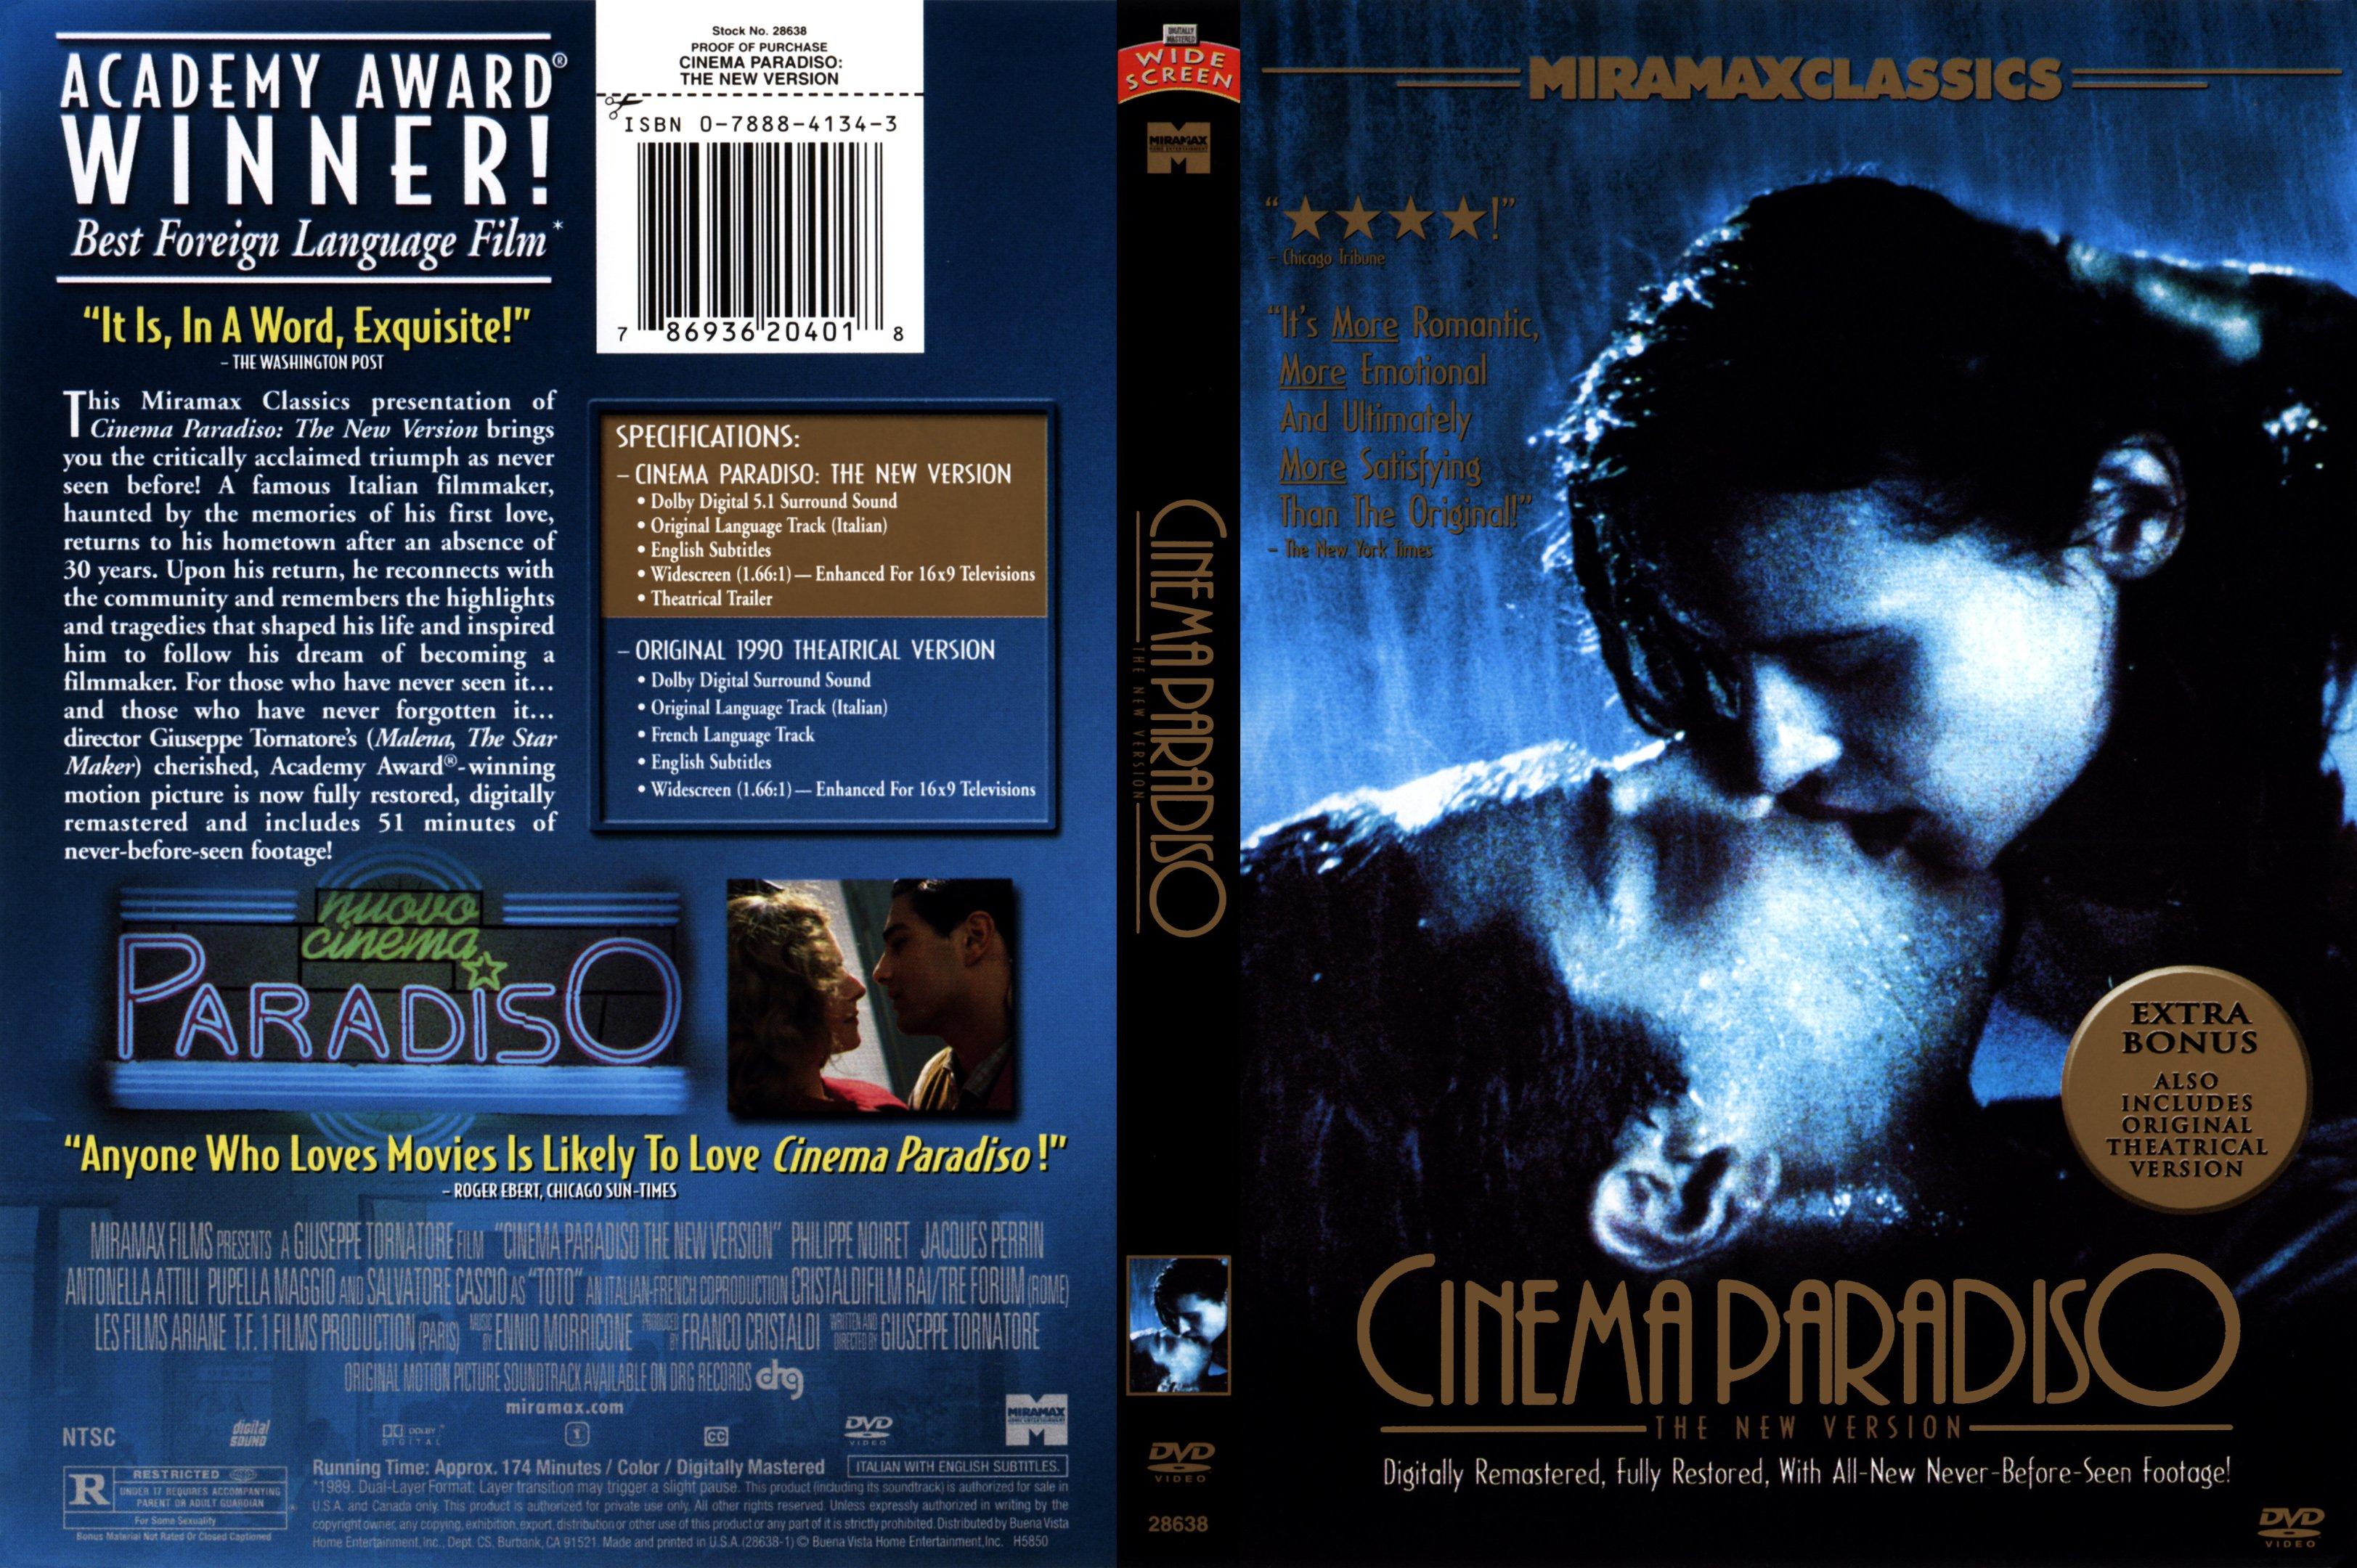 cinema paradiso full movie download